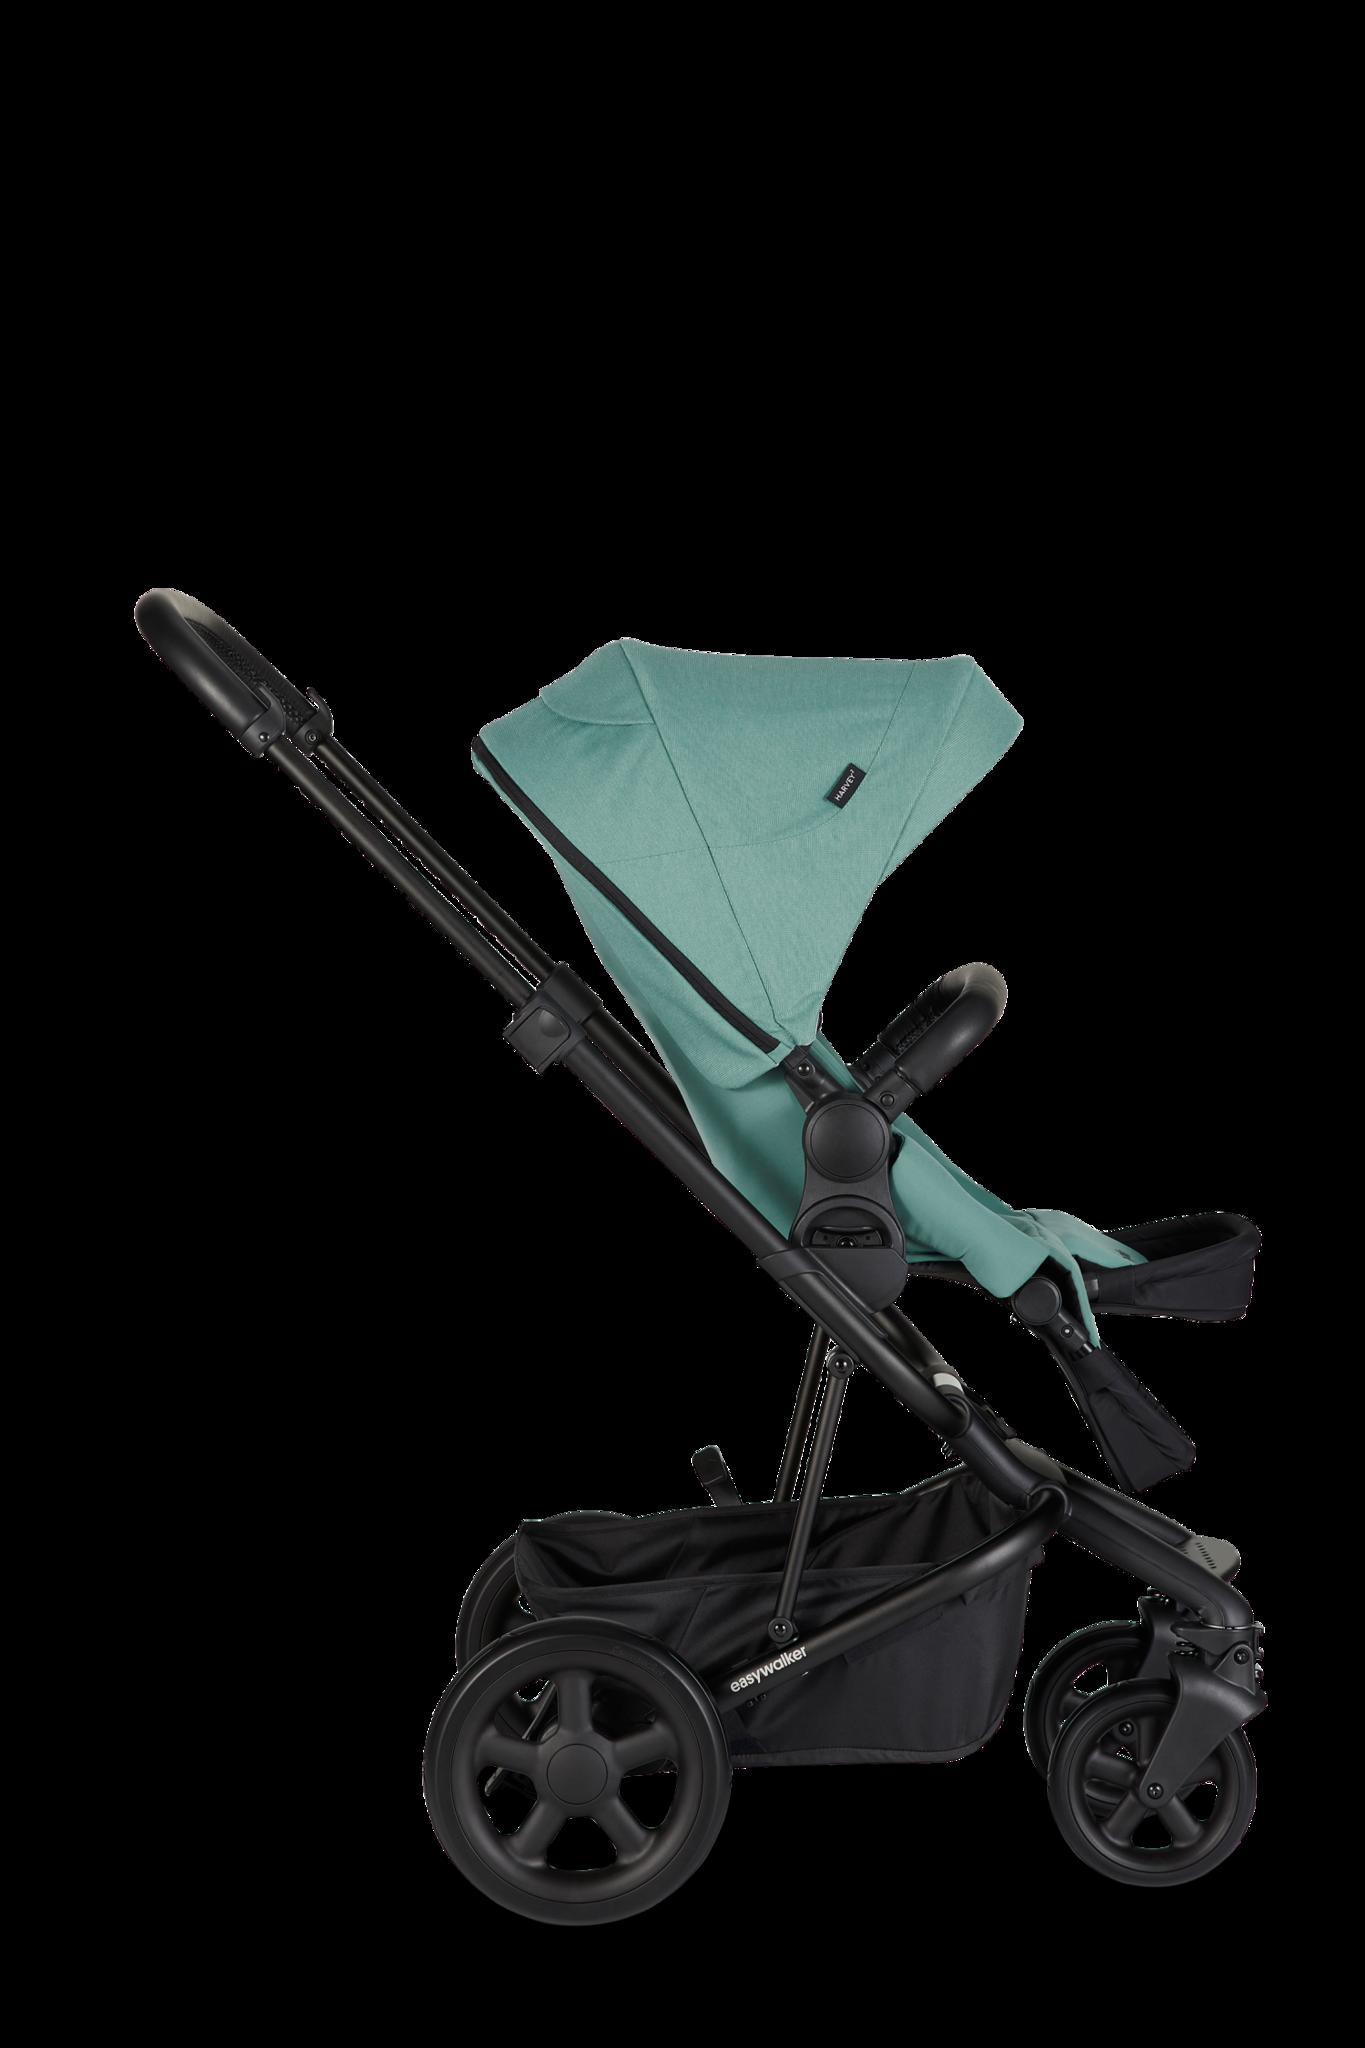 Easywalker Harvey² Kinderwagen + Reiswieg + Voetenzak + Autostoel-adapter + Hoogte-adapter Ocean Blue